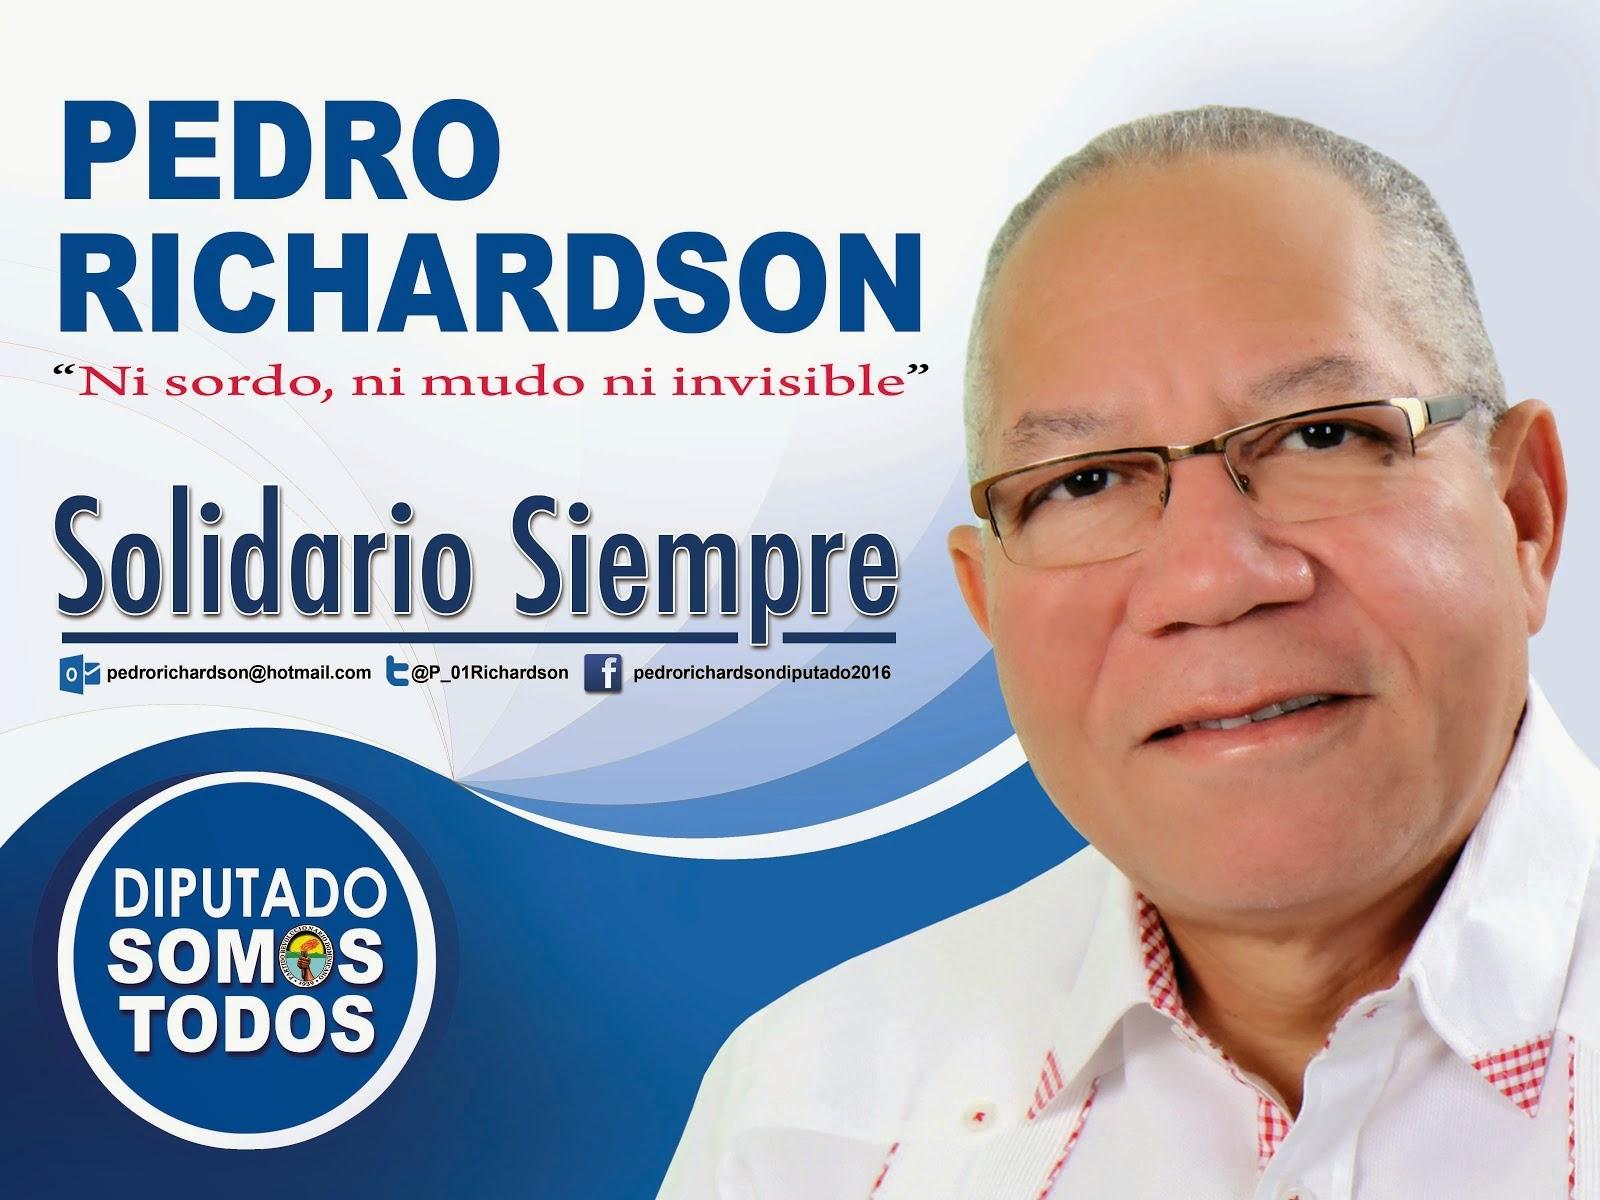 PEDRO RICHARDSON DIPUTADO